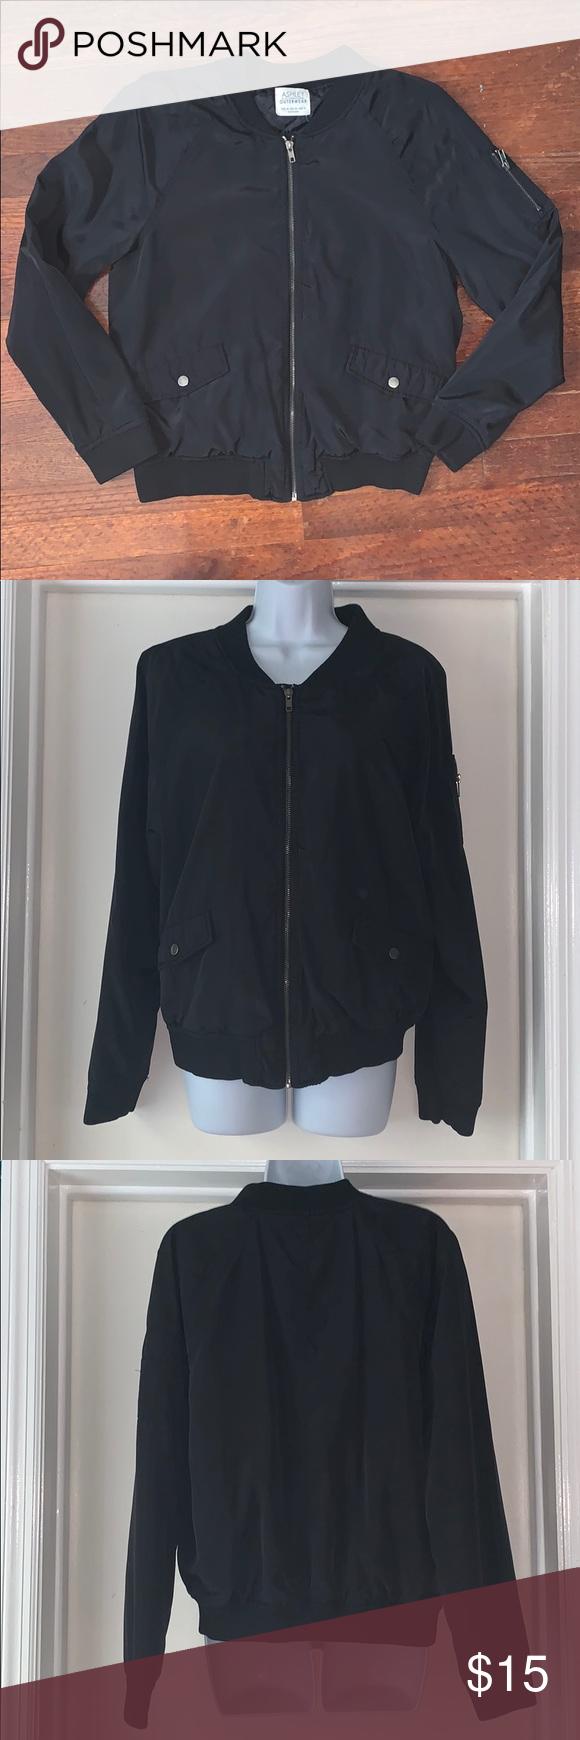 Ashley Outerwear Black Bomber Jacket Size Medium Black Bomber Jacket Clothes Design Black Bomber [ 1740 x 580 Pixel ]